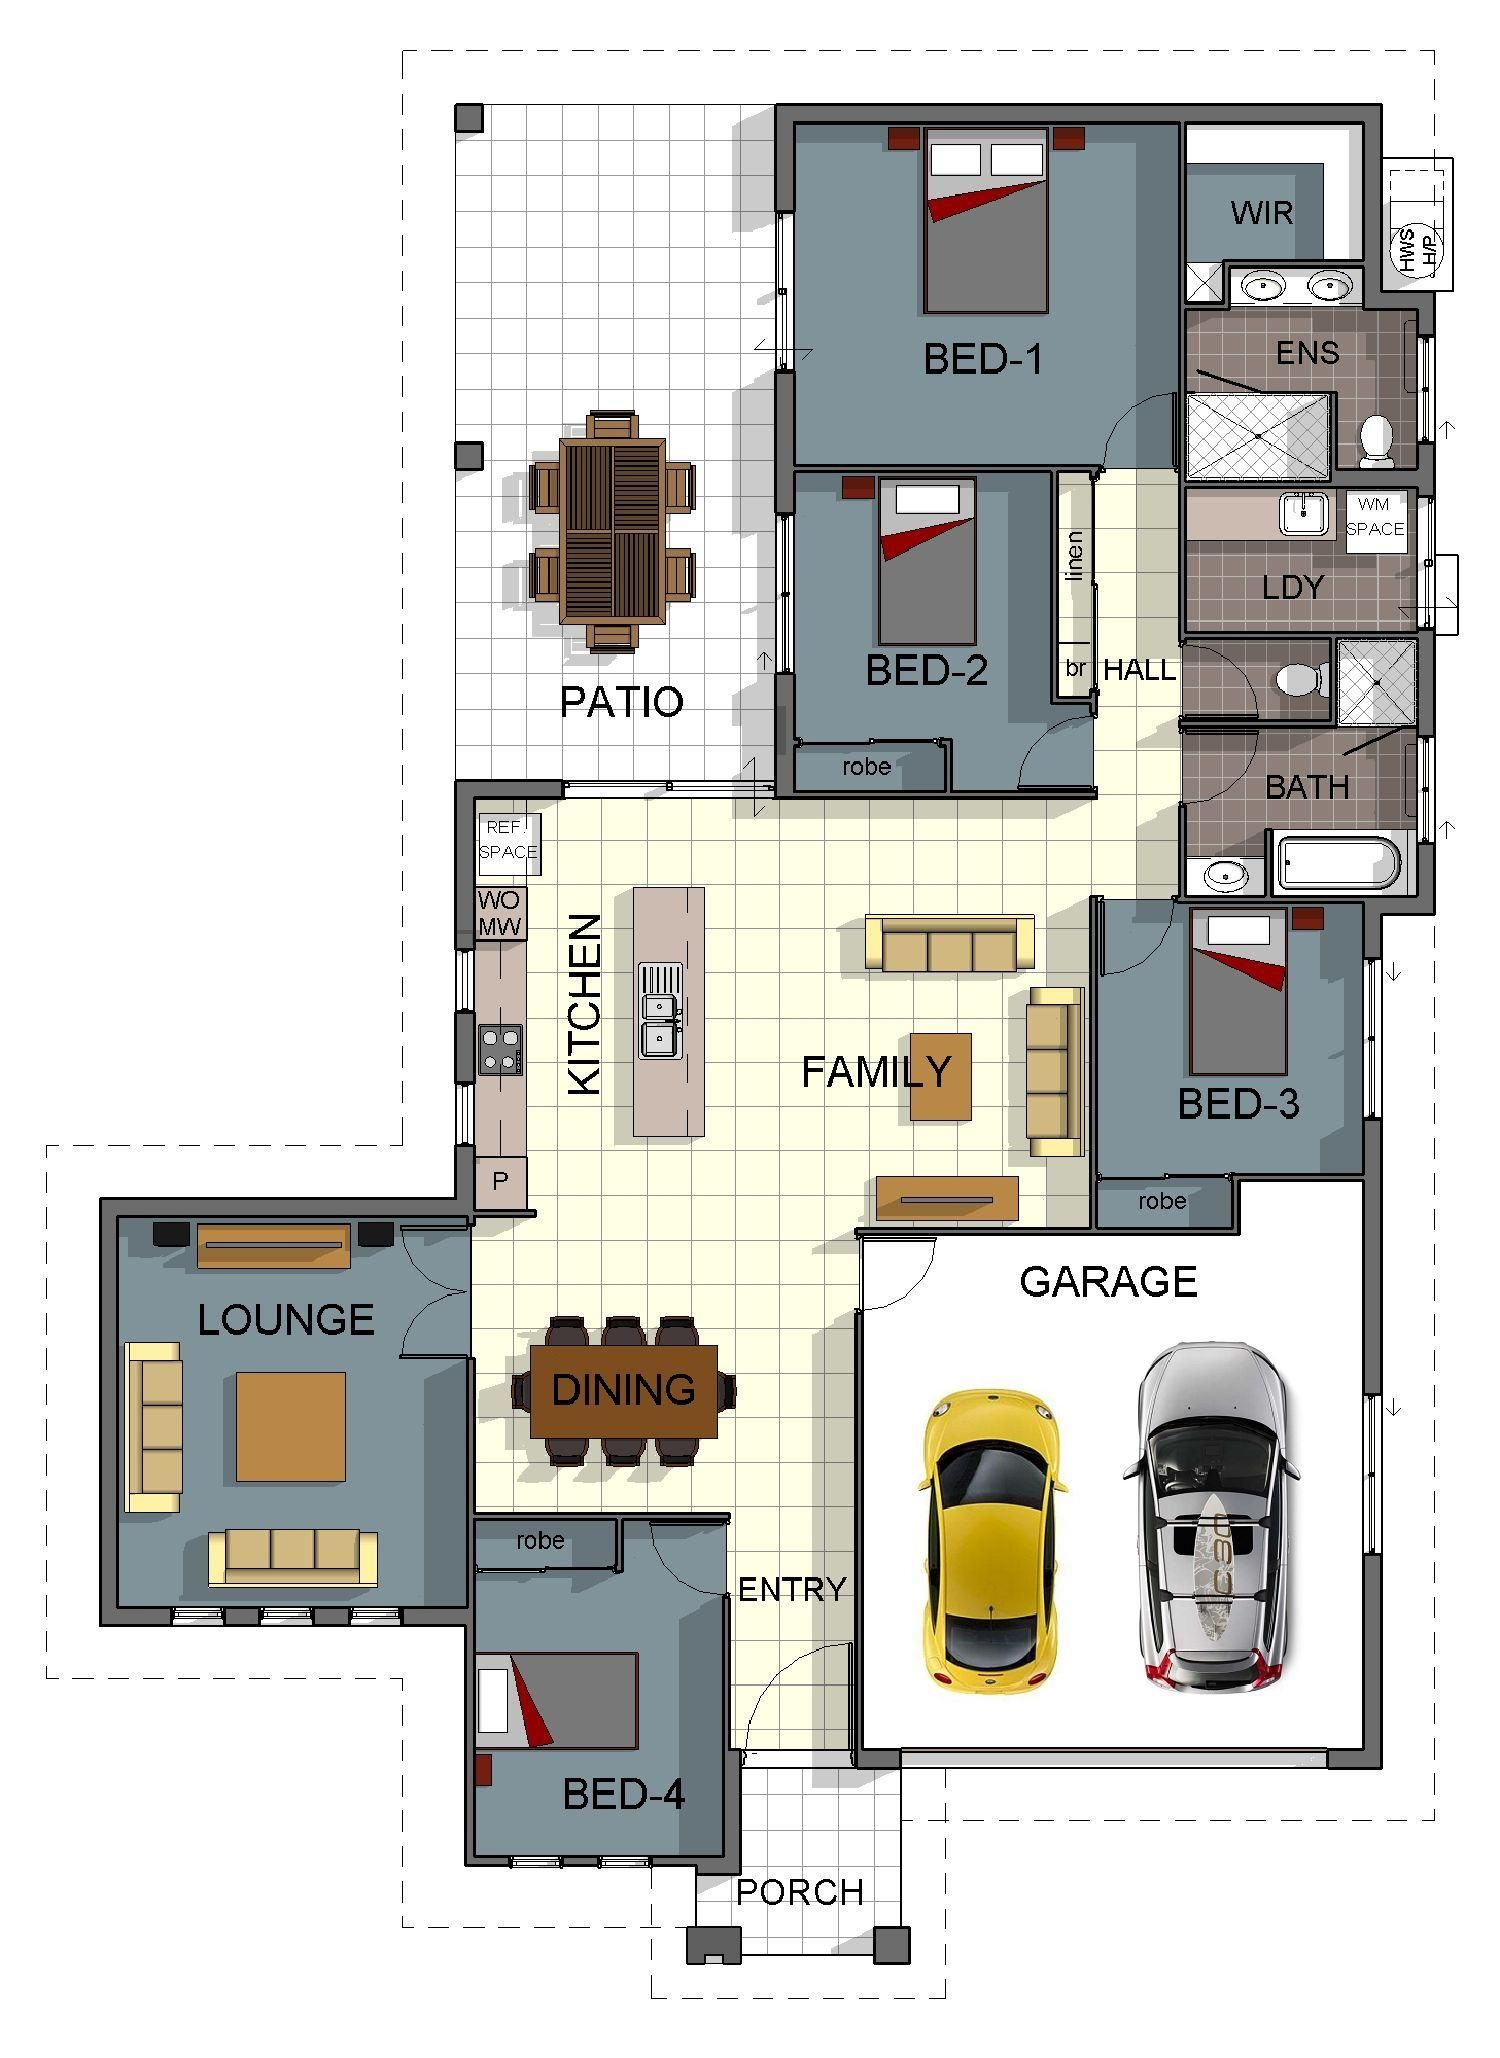 Single storey 4 bedroom house floorplan with additional